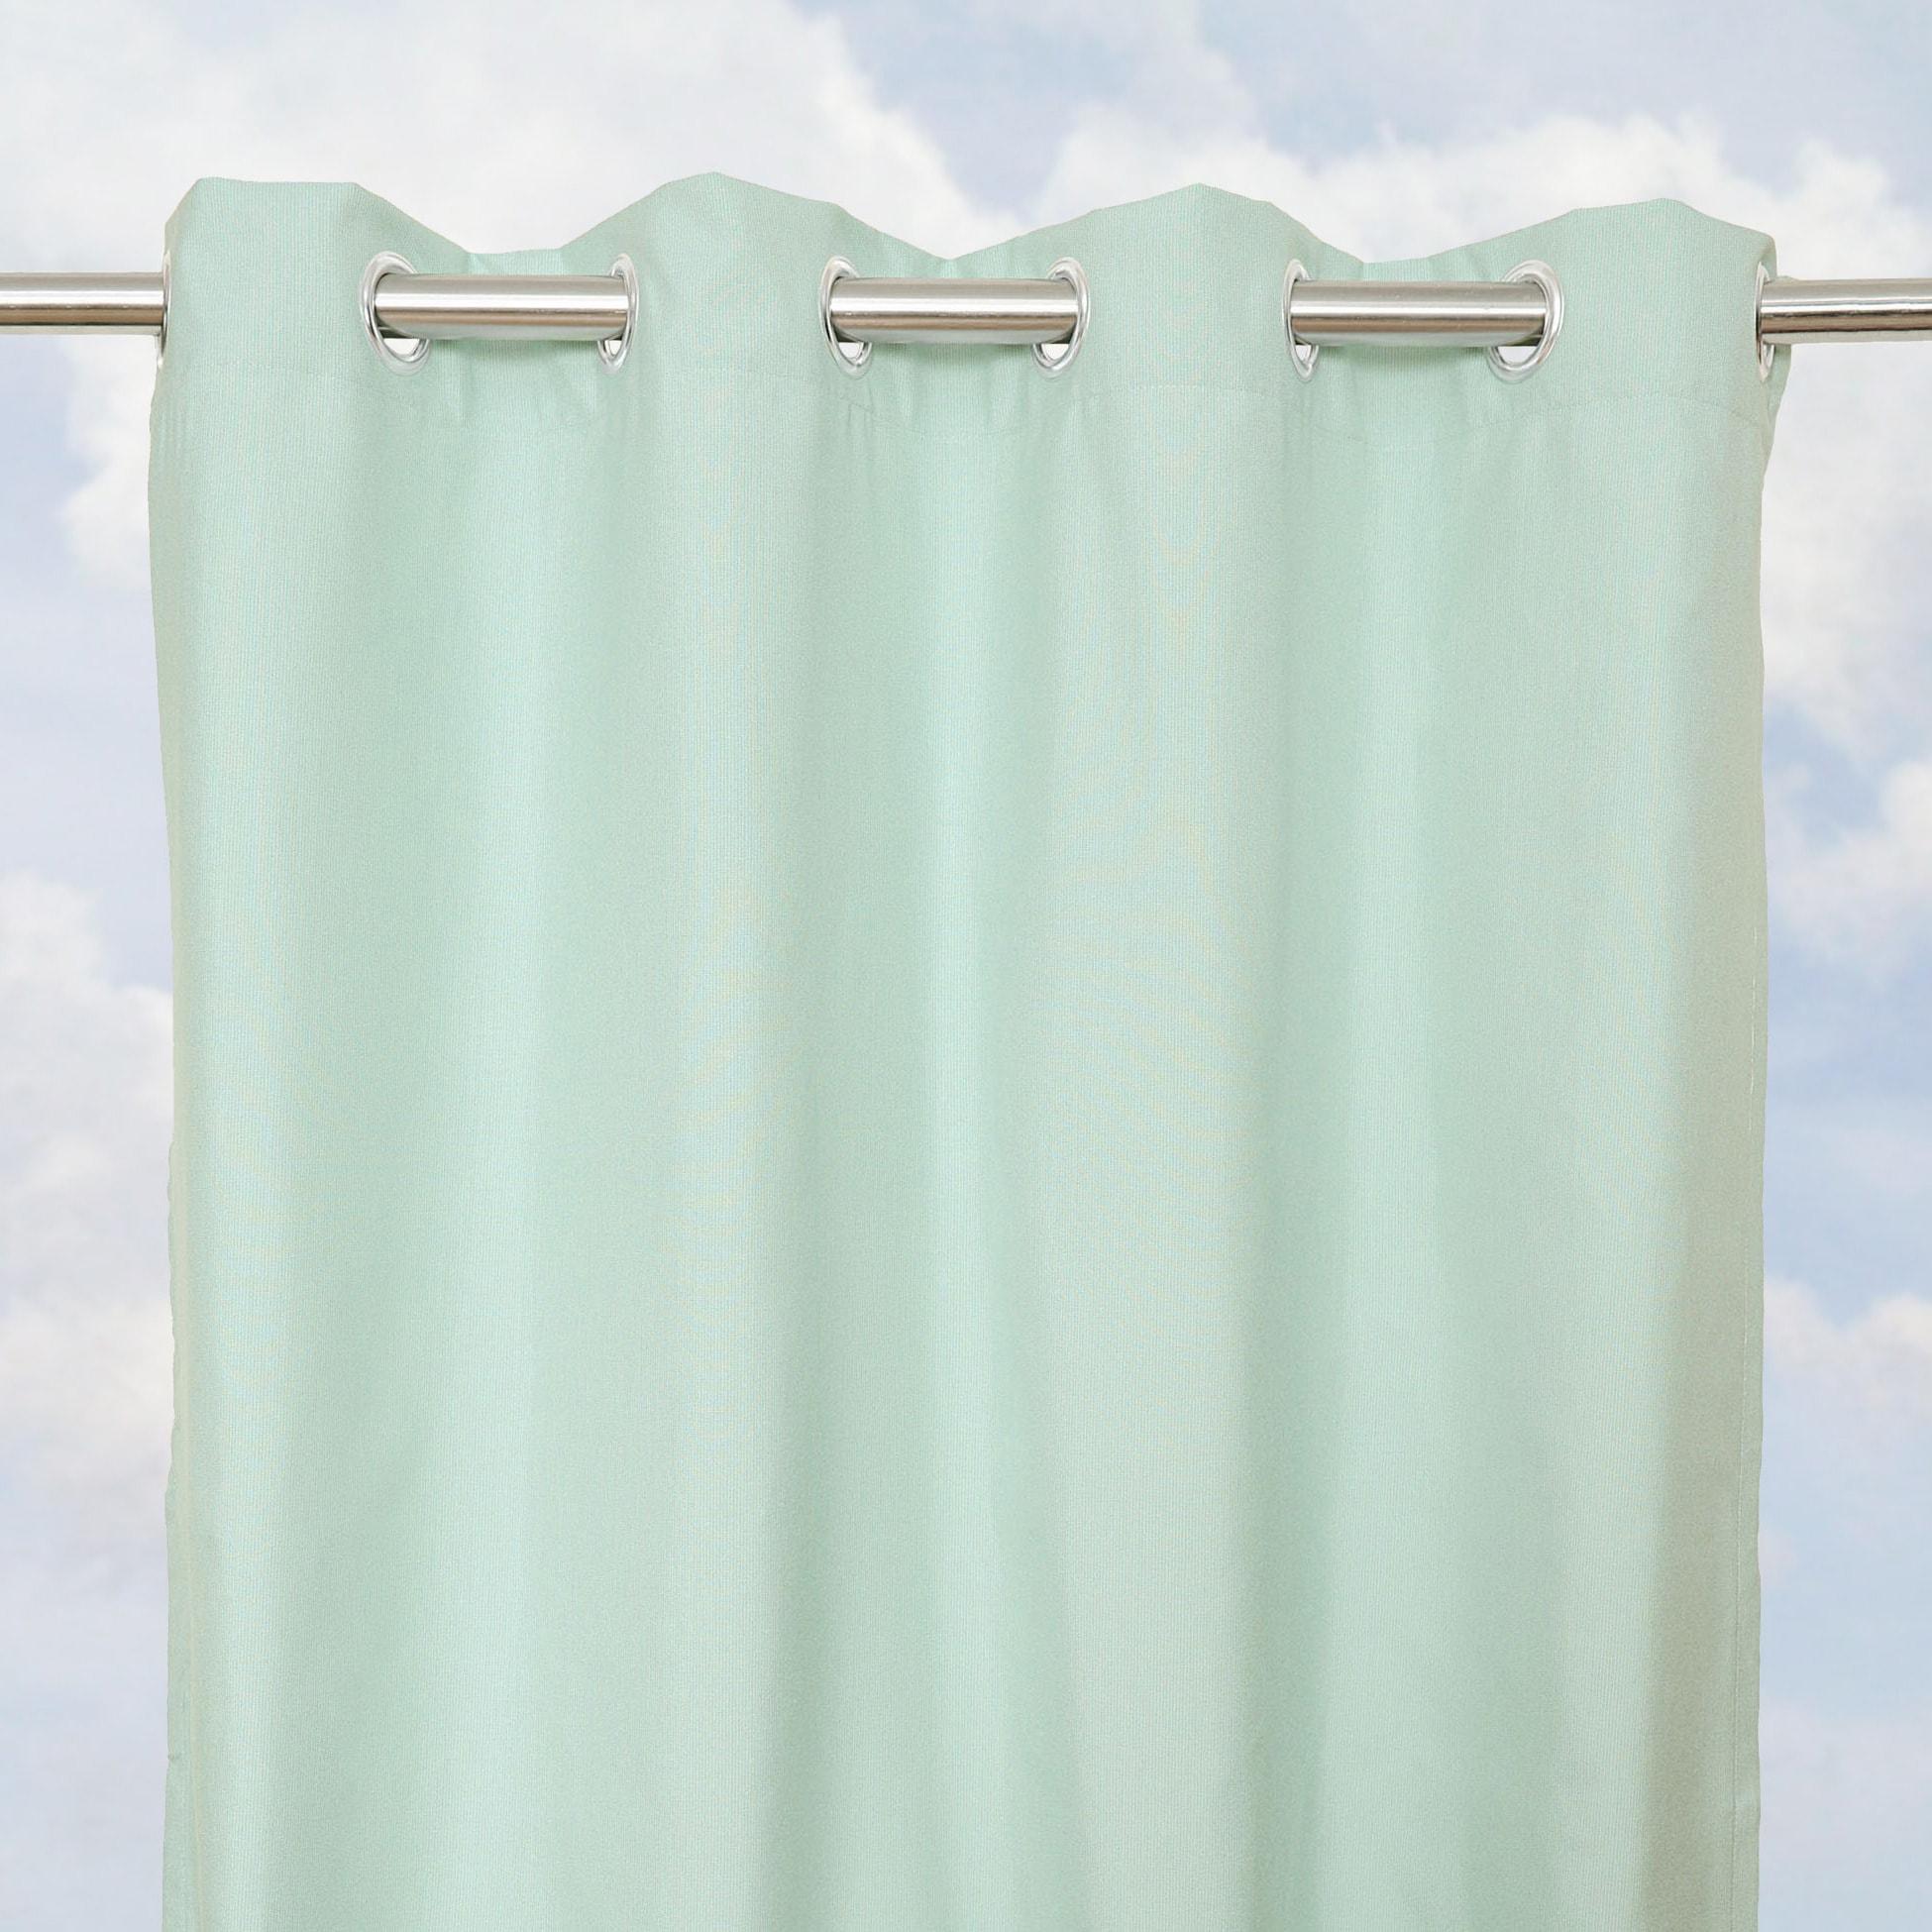 Sunbrella Bay View Mist 96-inch Outdoor Curtain Panel